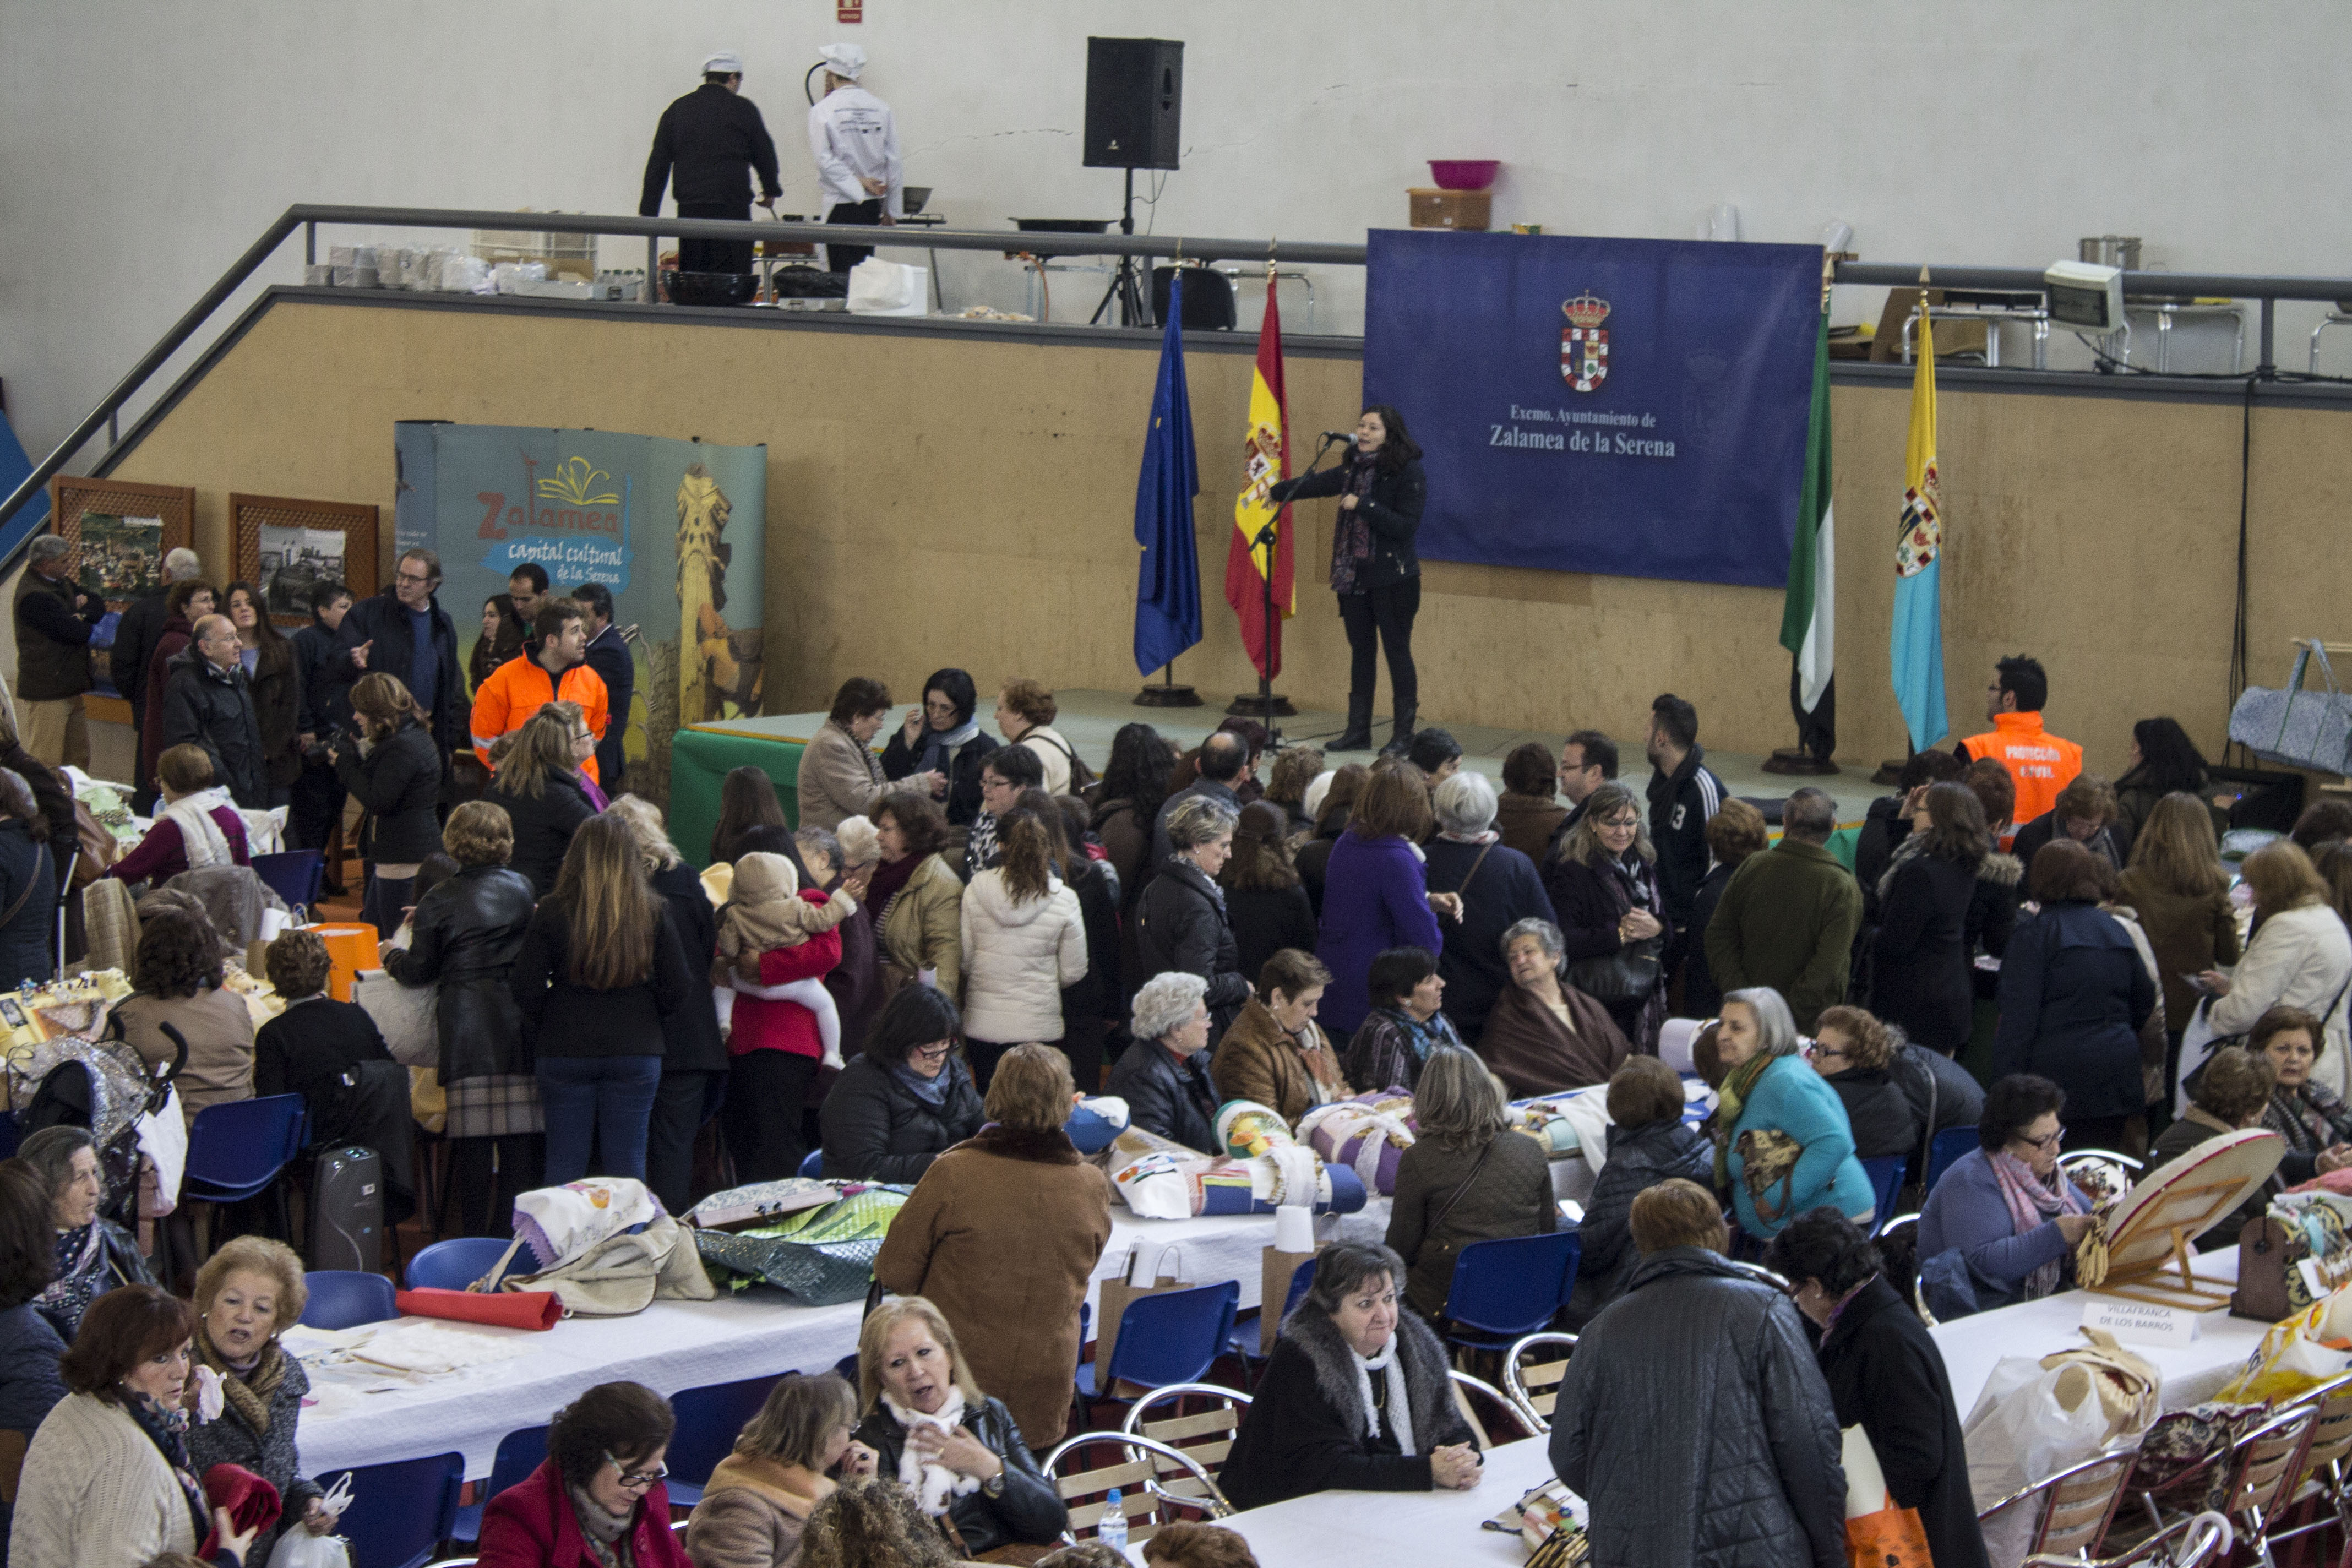 I Encuentro de Bolilleras en Zalamea